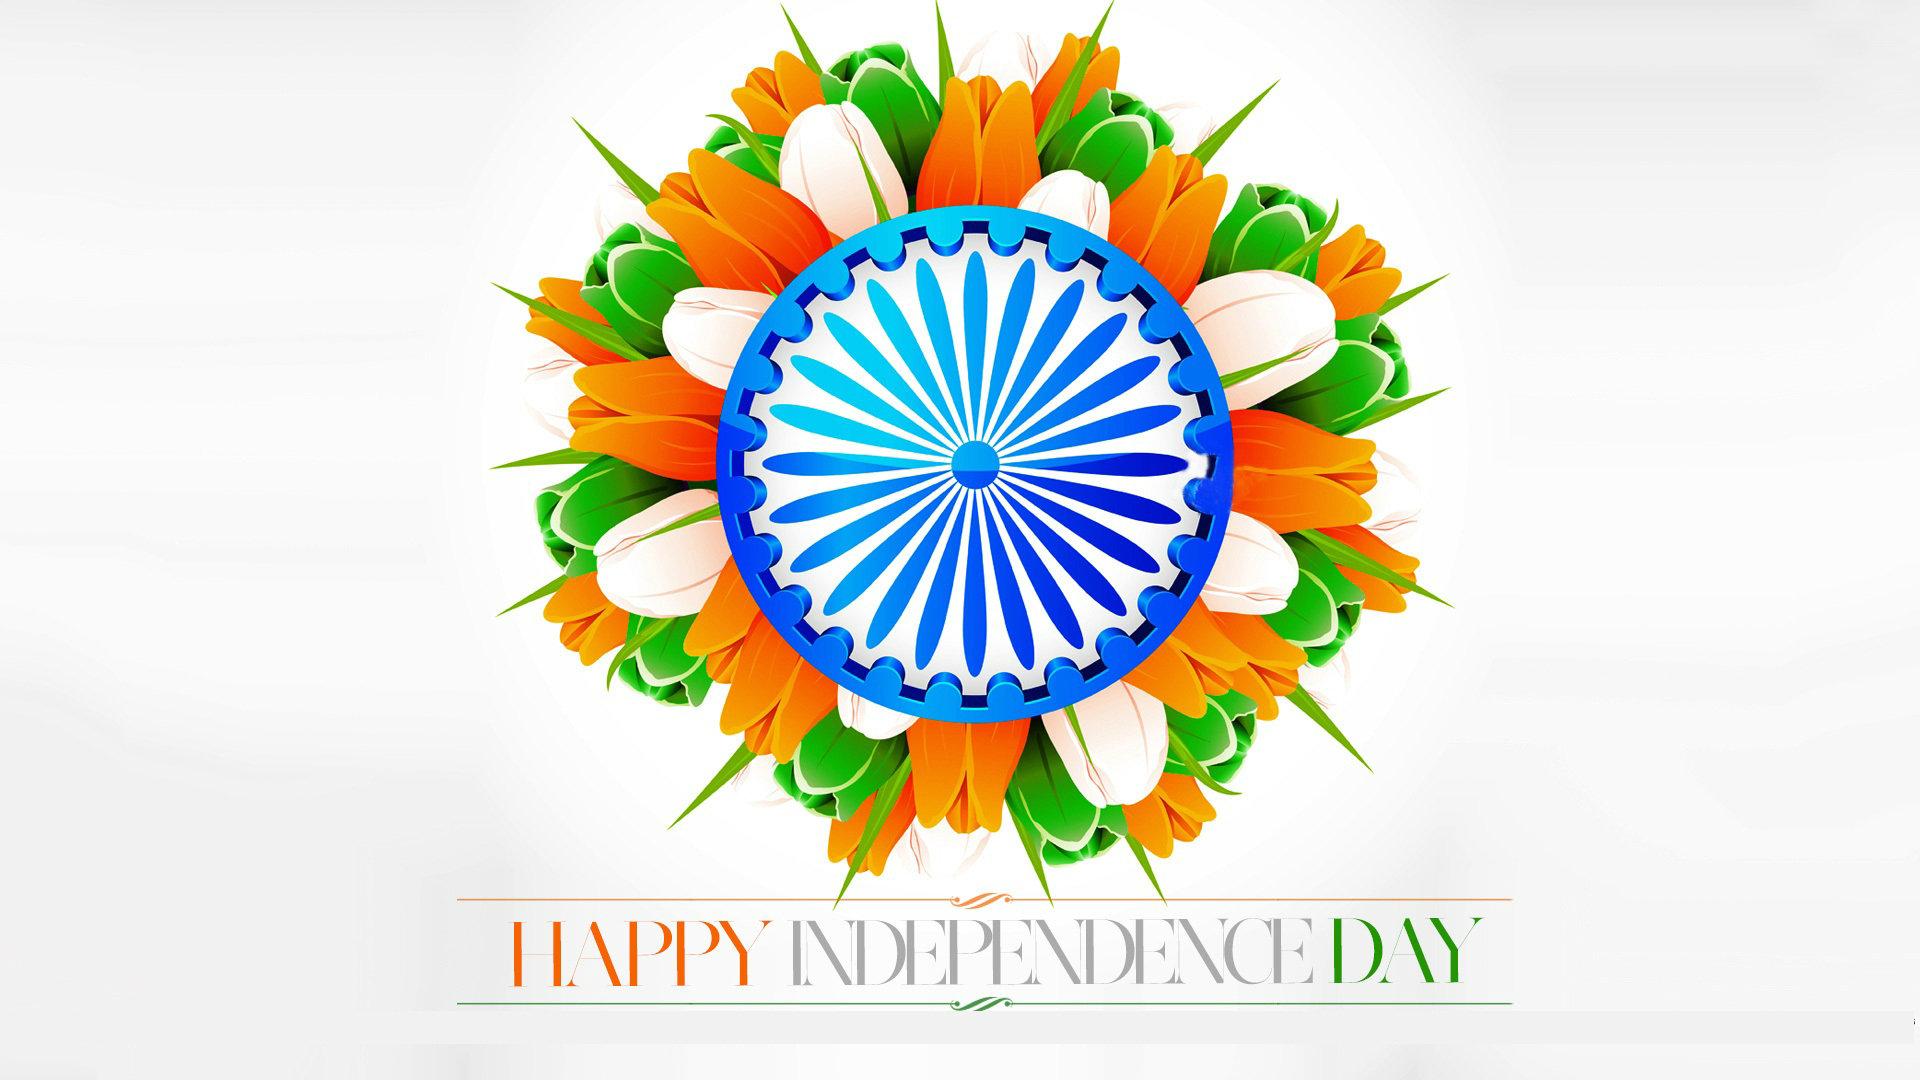 Happy Republic Day Flowers Orange White Green Image